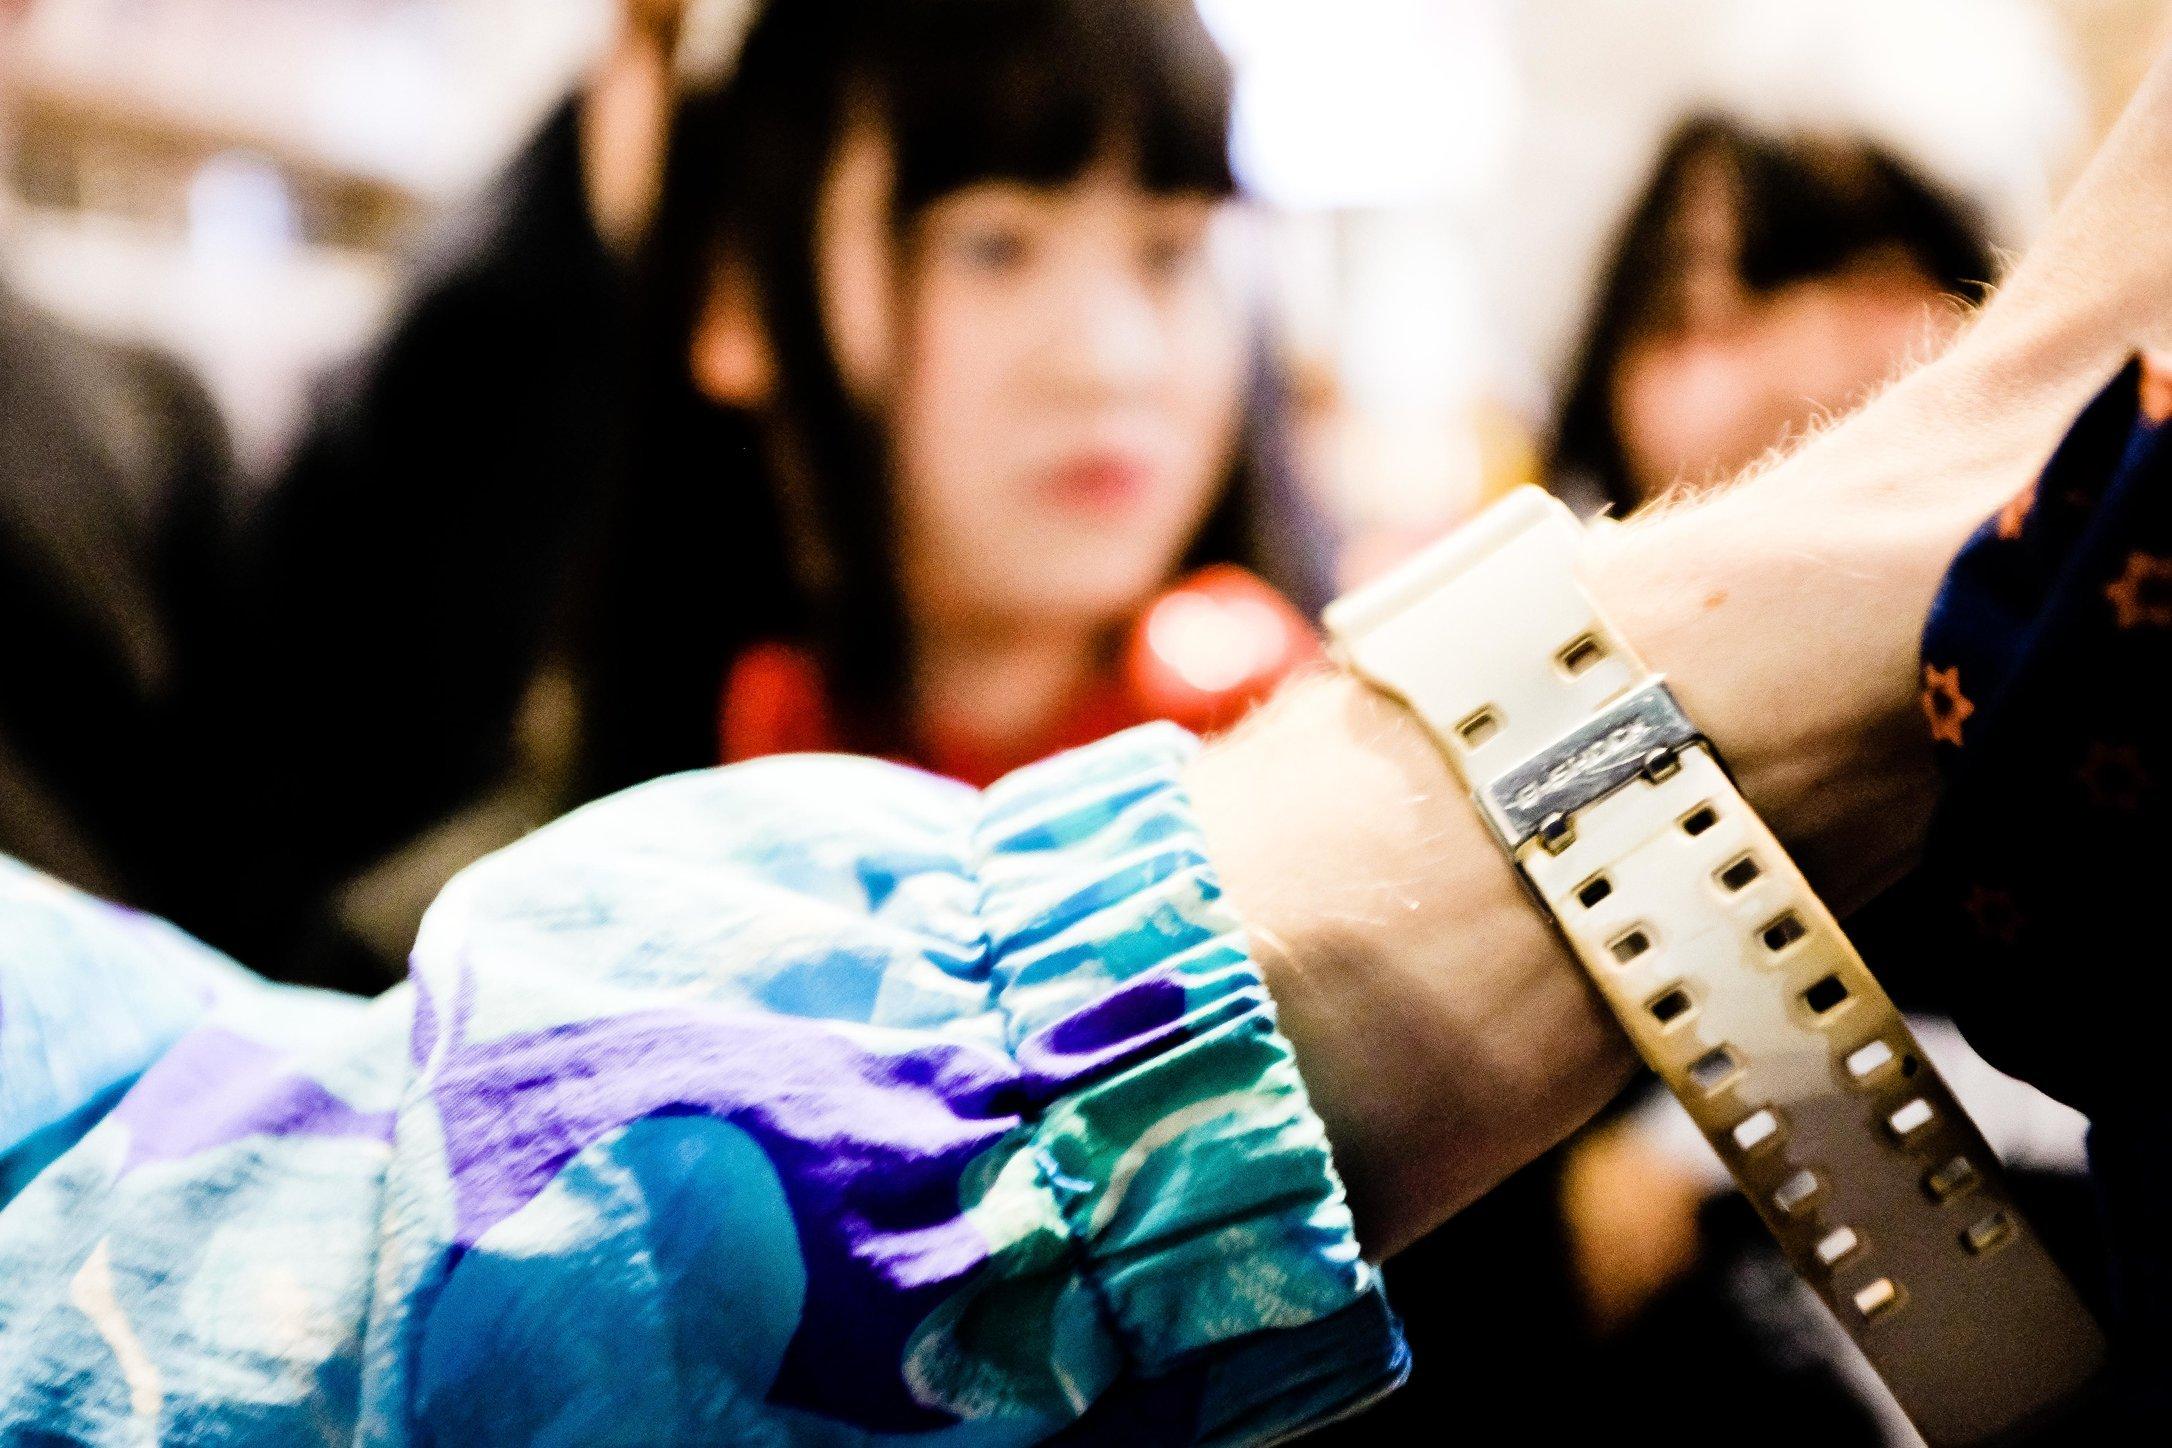 ShibuyaTimeWebsite-10.jpg